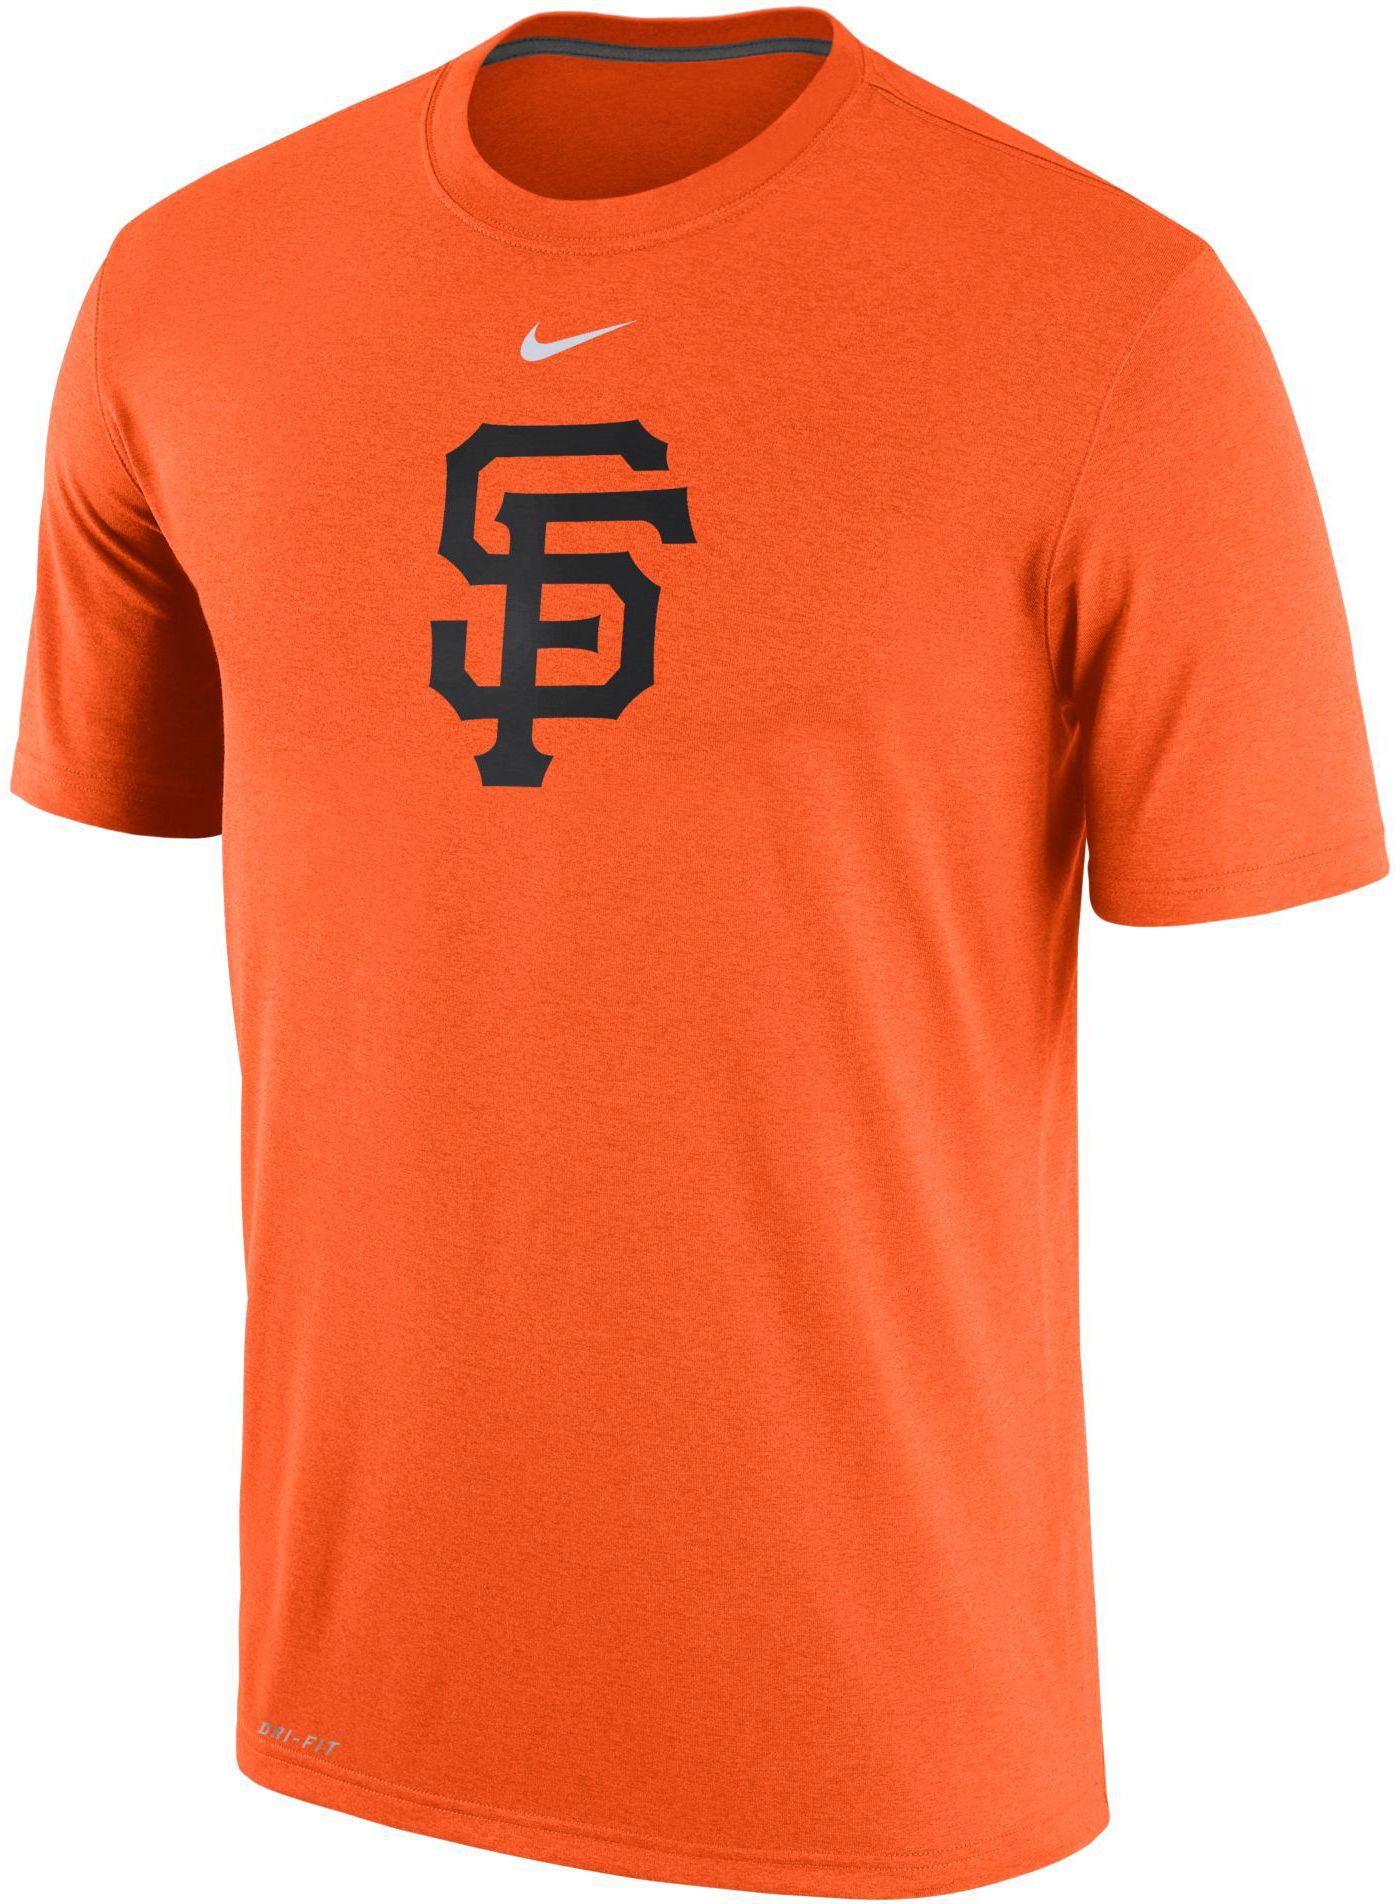 Nike Men's San Francisco Giants Dri-FIT Legend T-Shirt